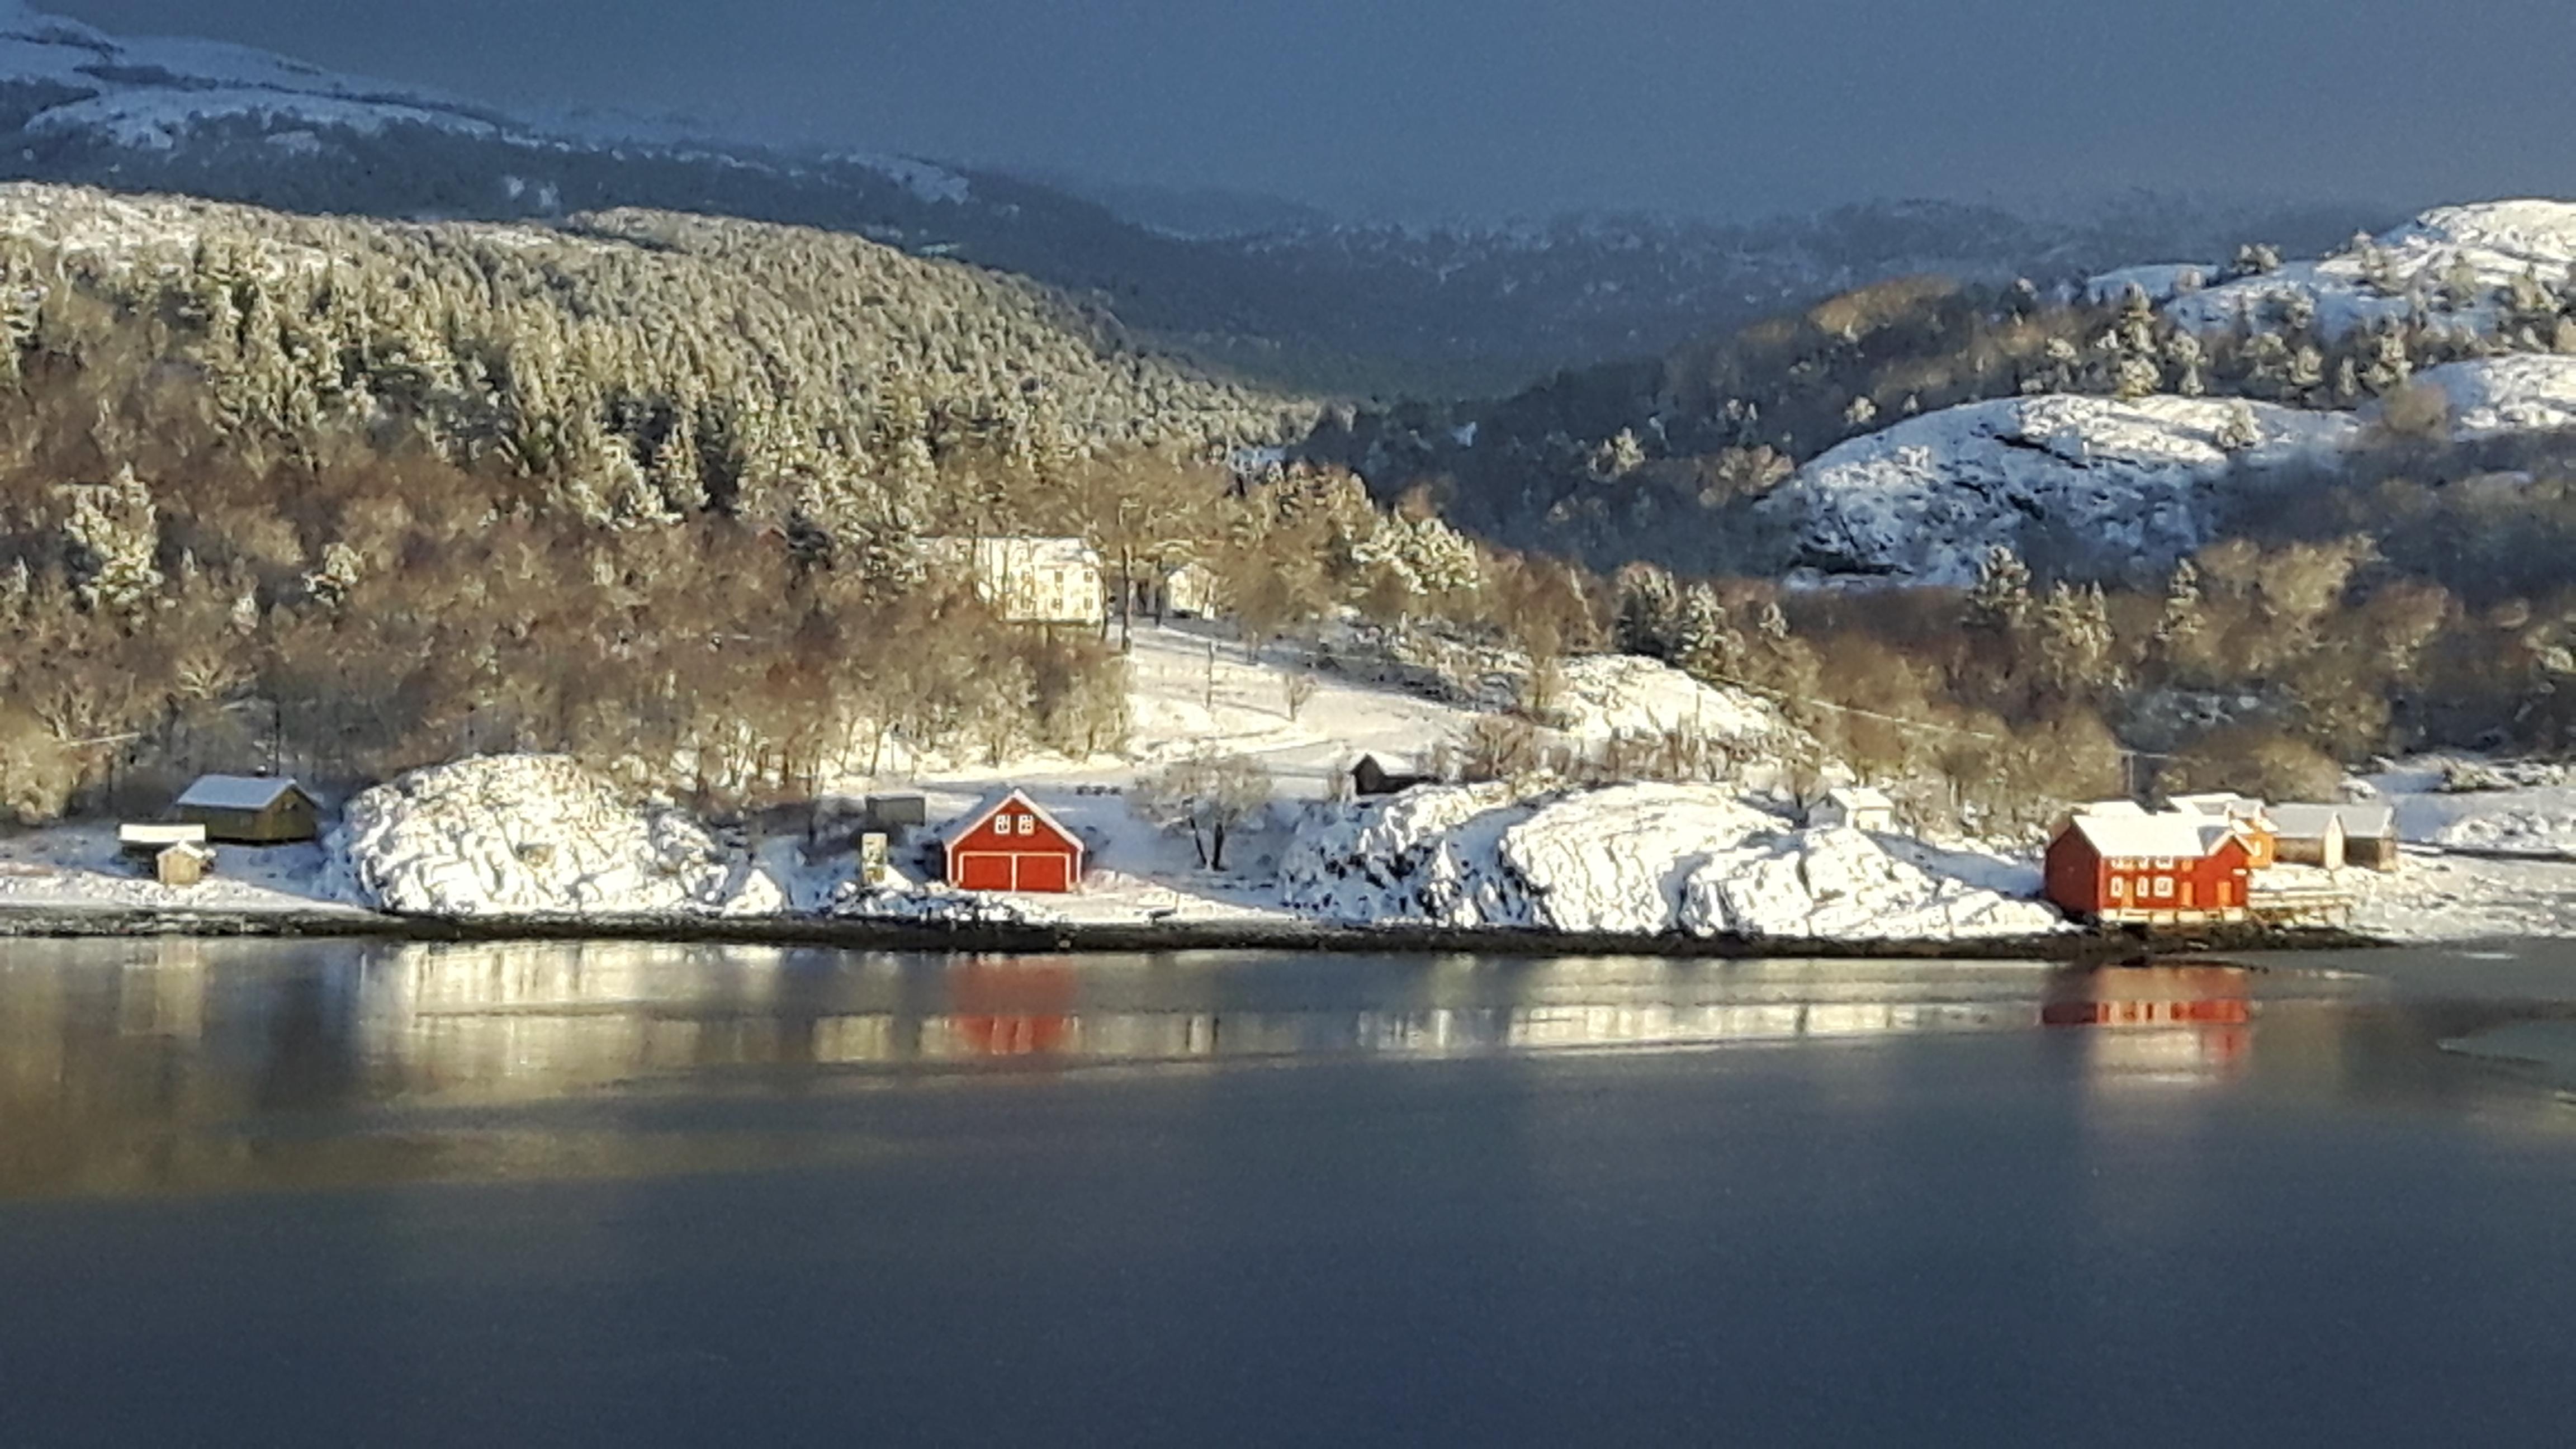 Mølnargården er åpen for arrangementer også om vinteren. Copyright: Mølnargården